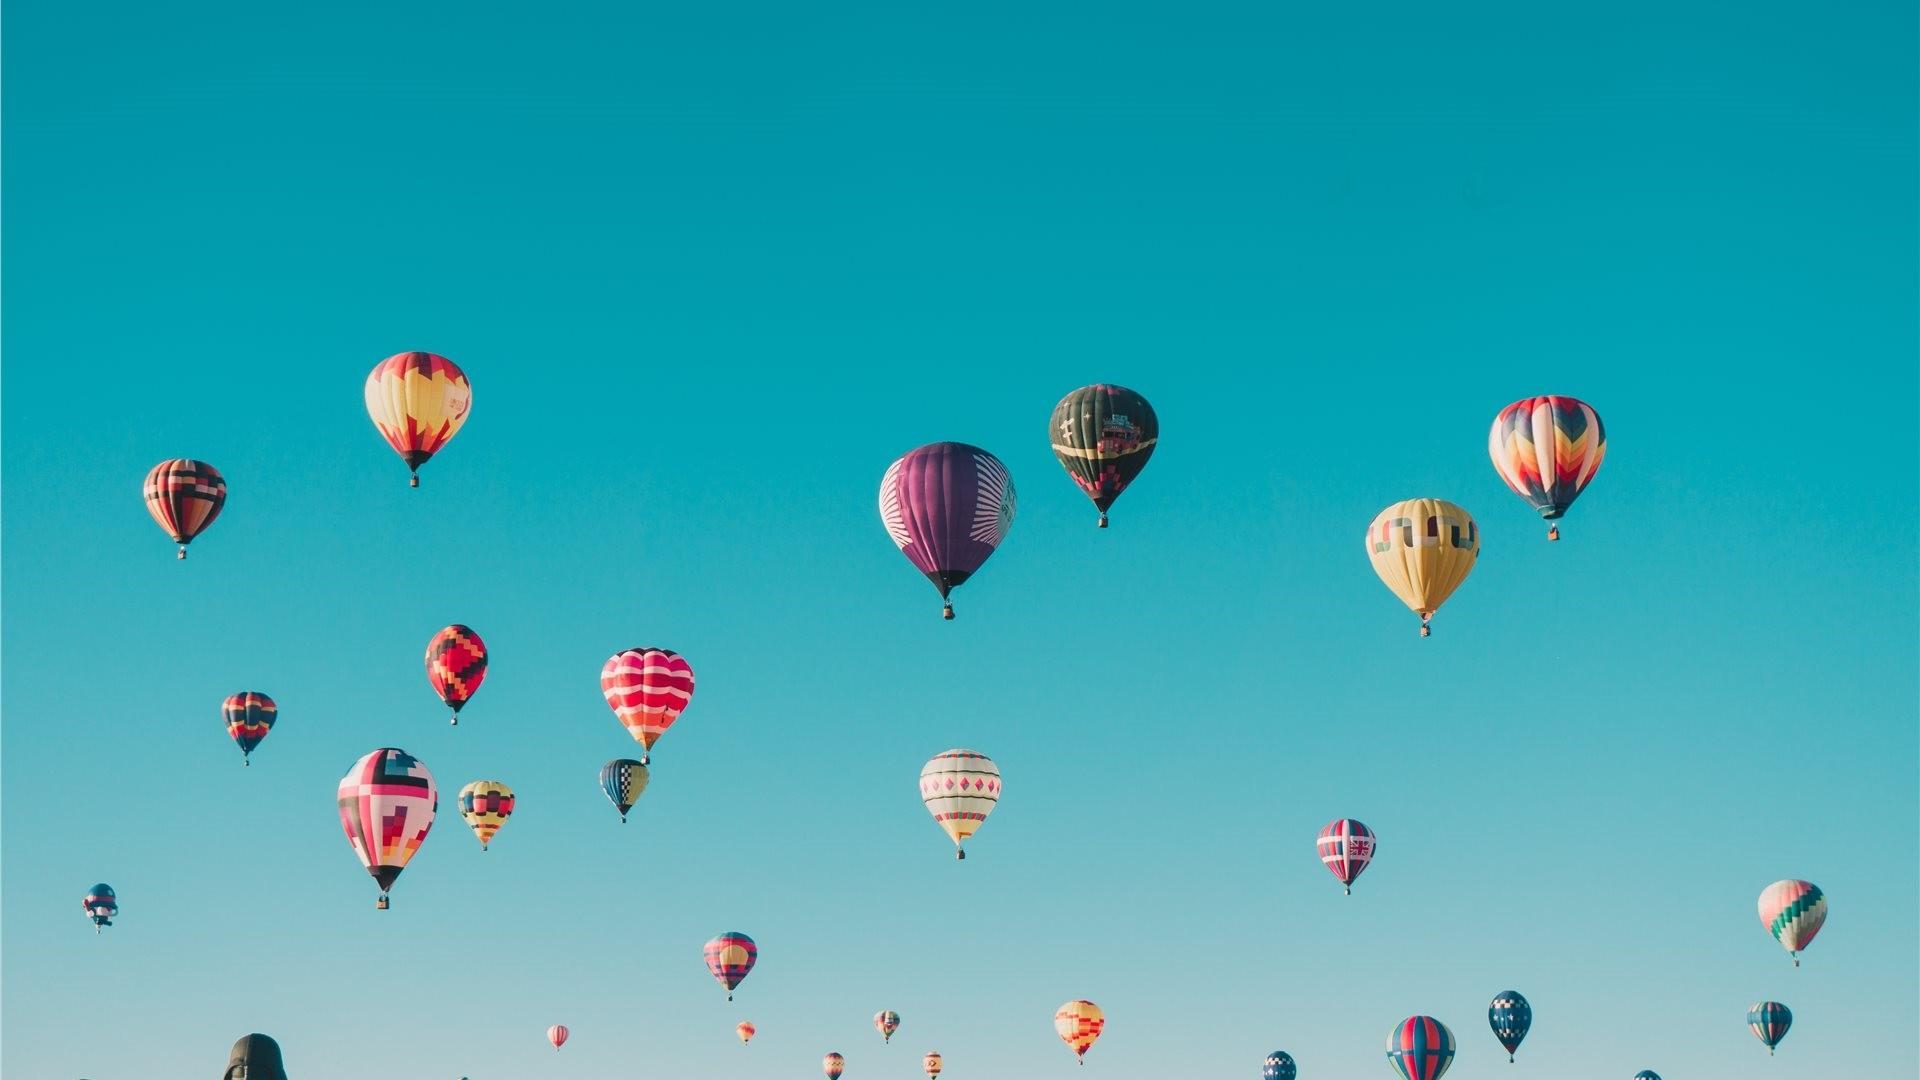 Balloon hd wallpaper download